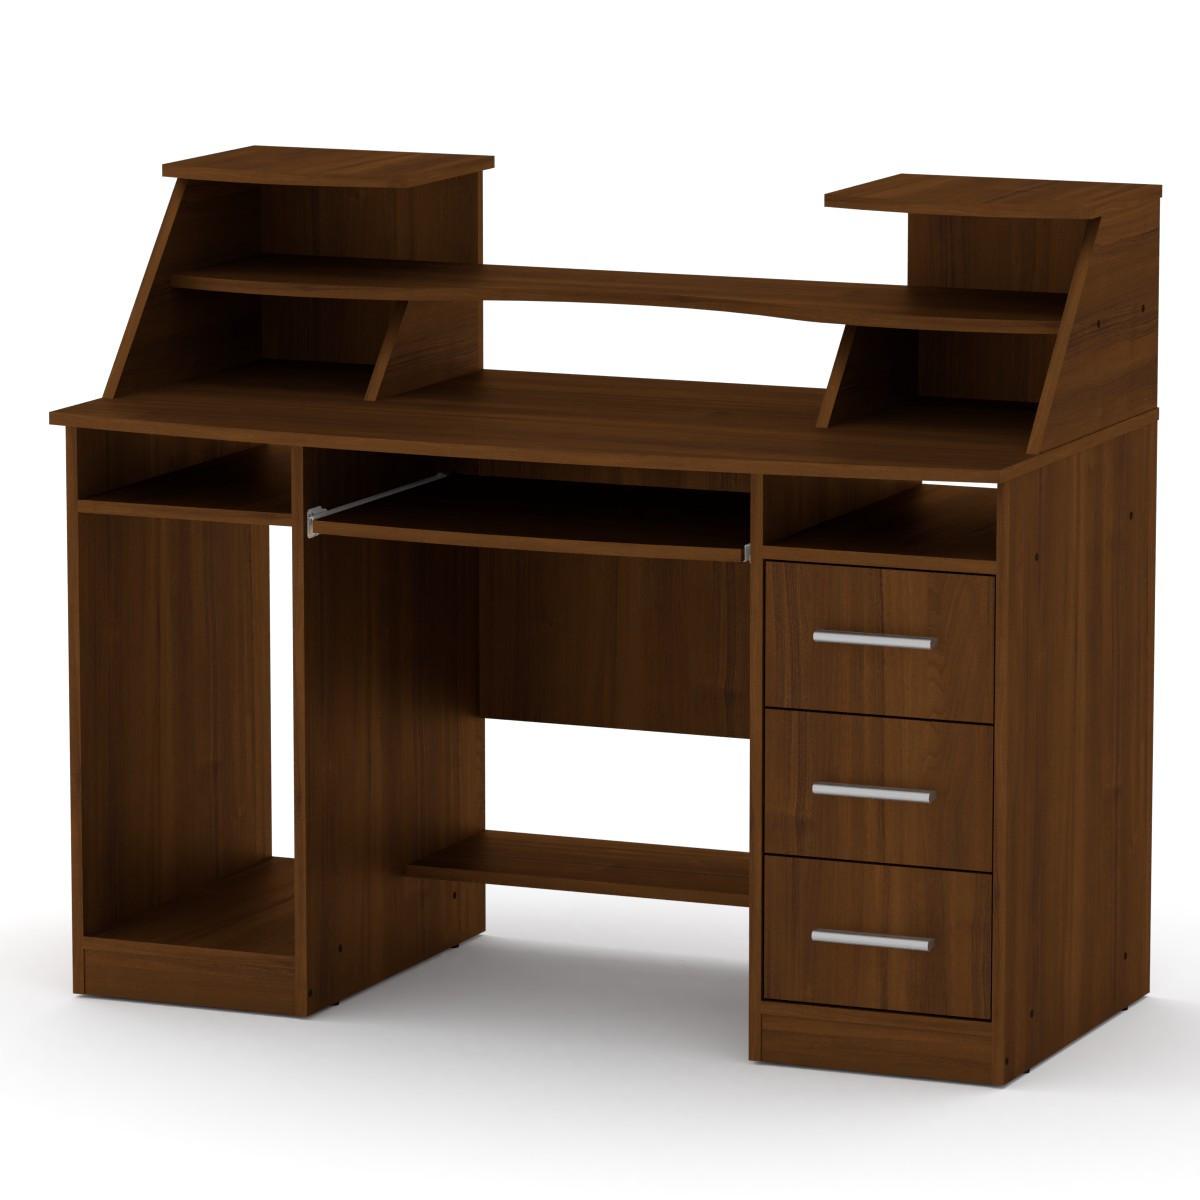 Стол компьютерный Комфорт-5 орех экко Компанит (127х65х104 см)